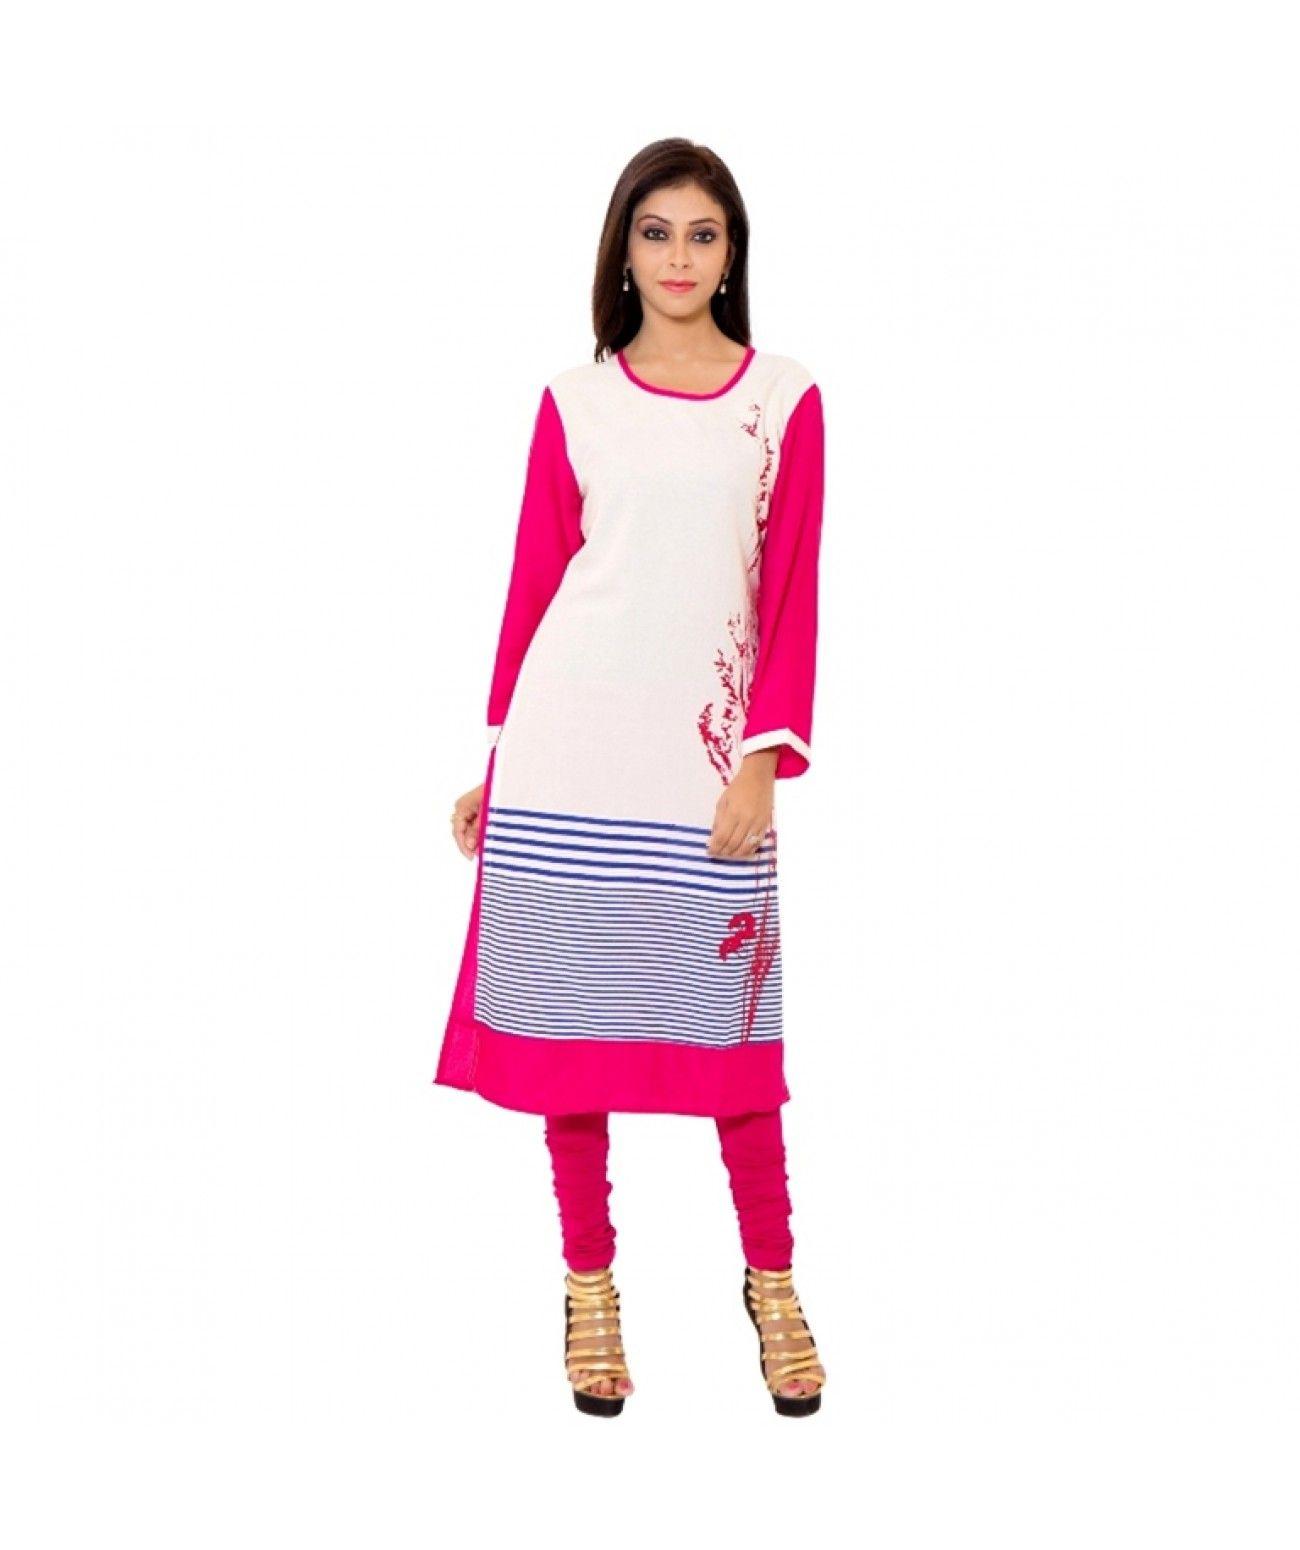 Woman's garments